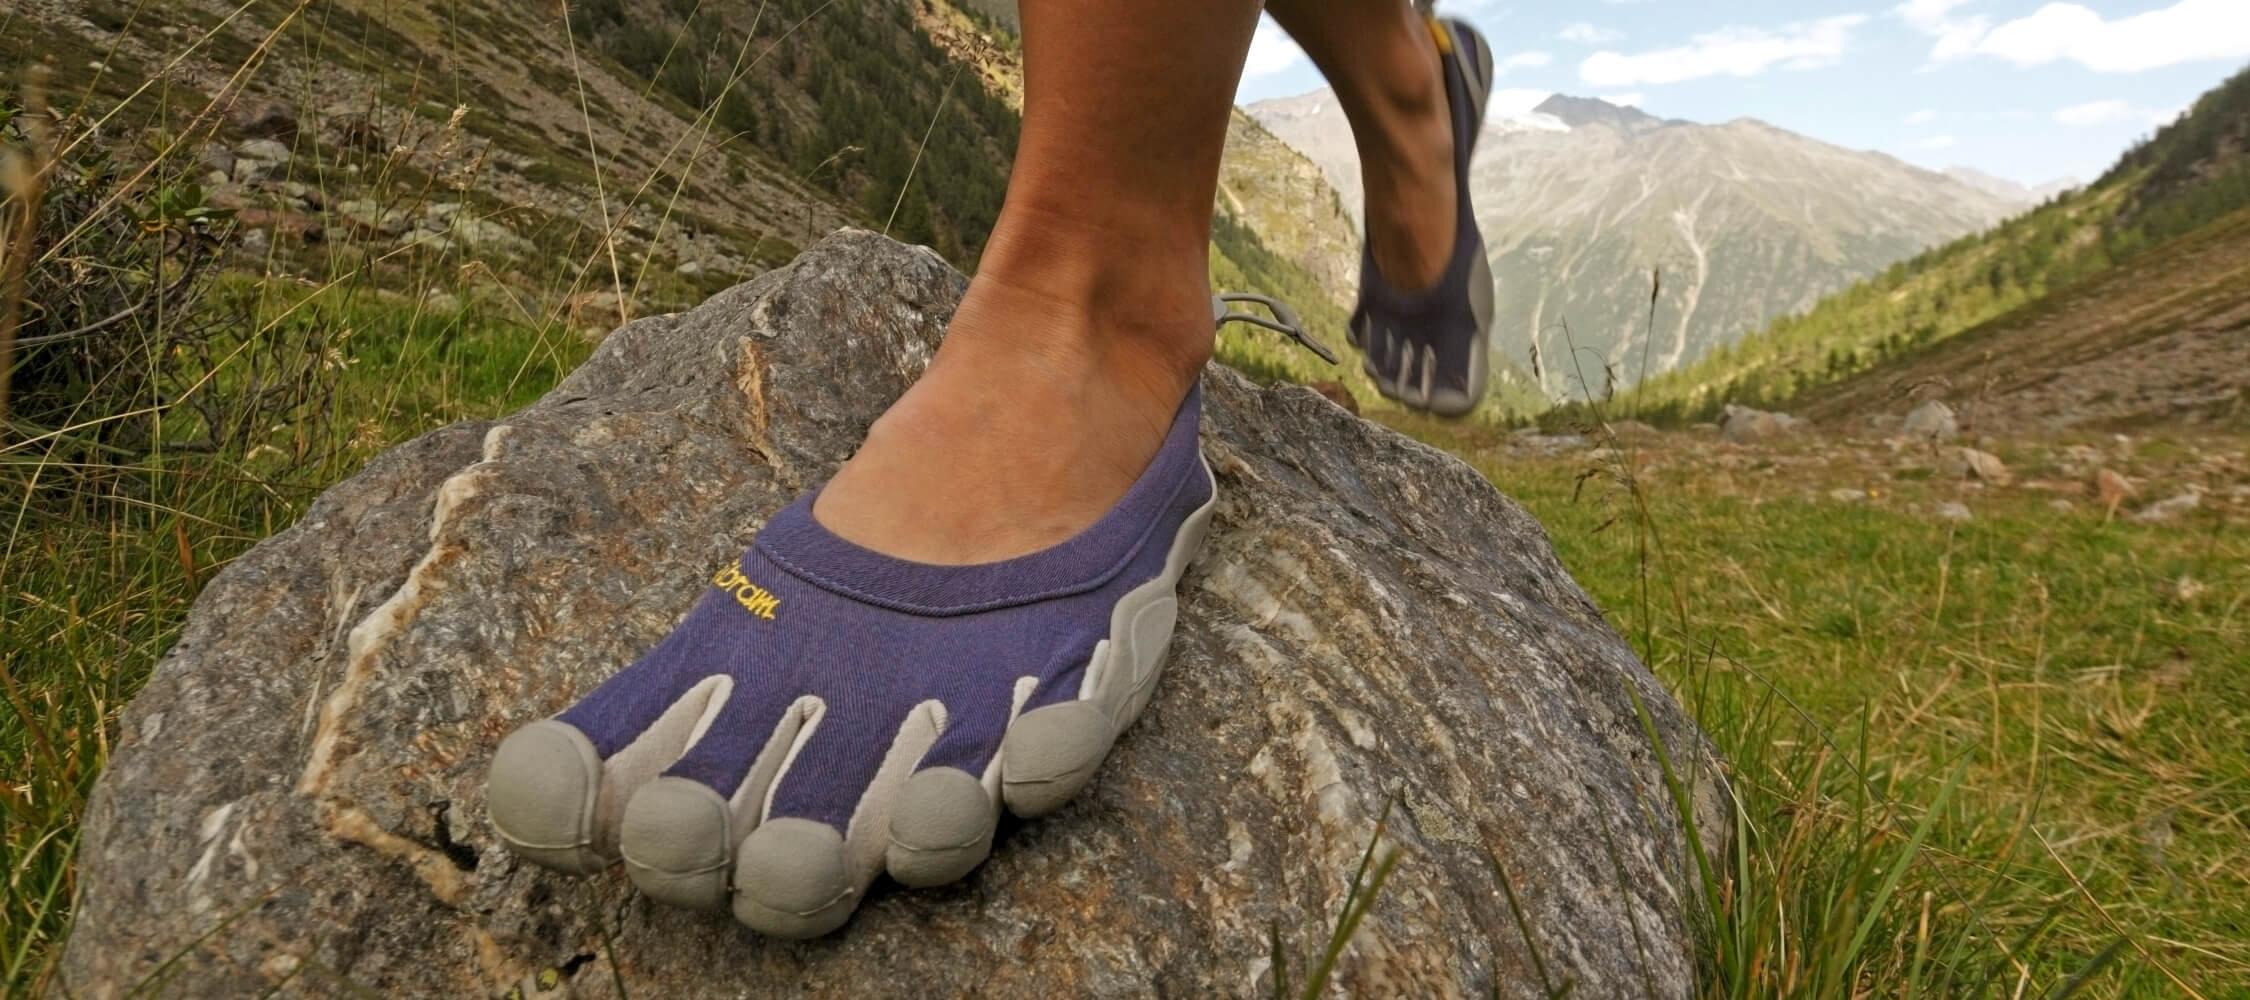 Italien-Trentino_Suedtirol_Alto_Adige_Merano_Meran_Natur_Sport_Sommer_Wandern_Berg_Barfuss_Five_Fingers_MGM-Frieder-Blickle_mgm00584frbl_2250x1000